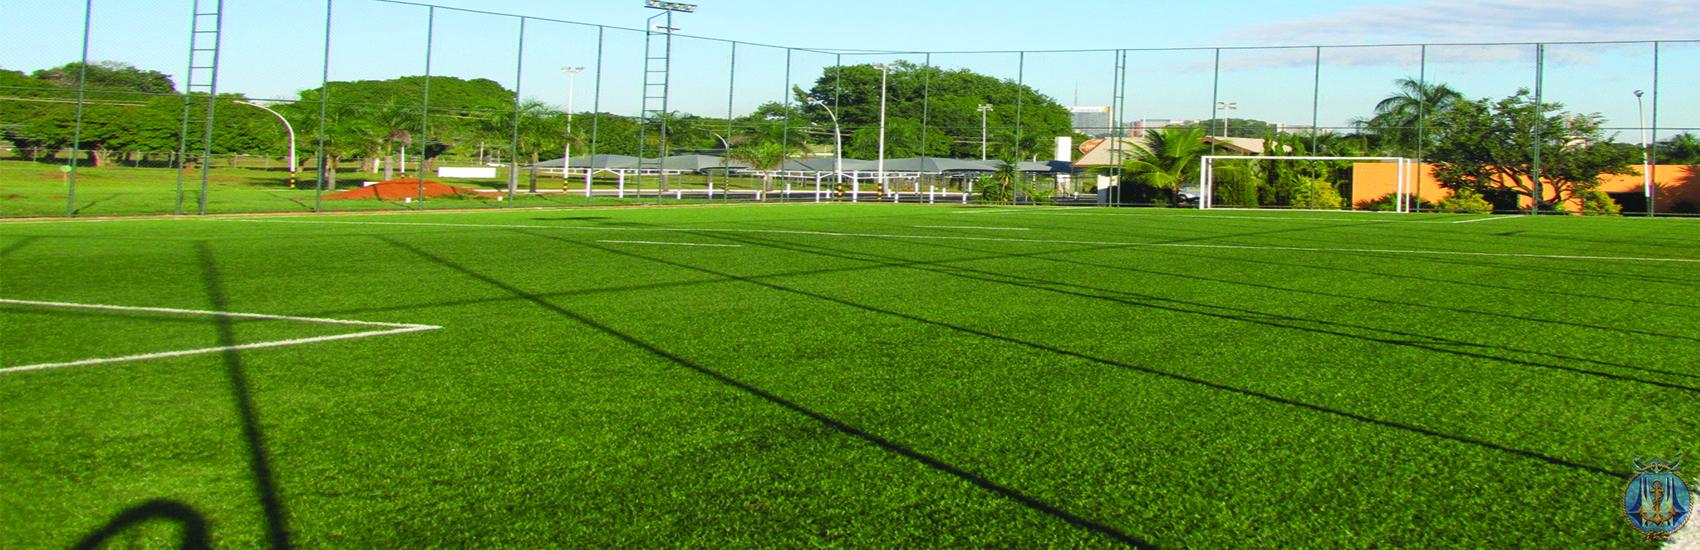 campo-futebol2